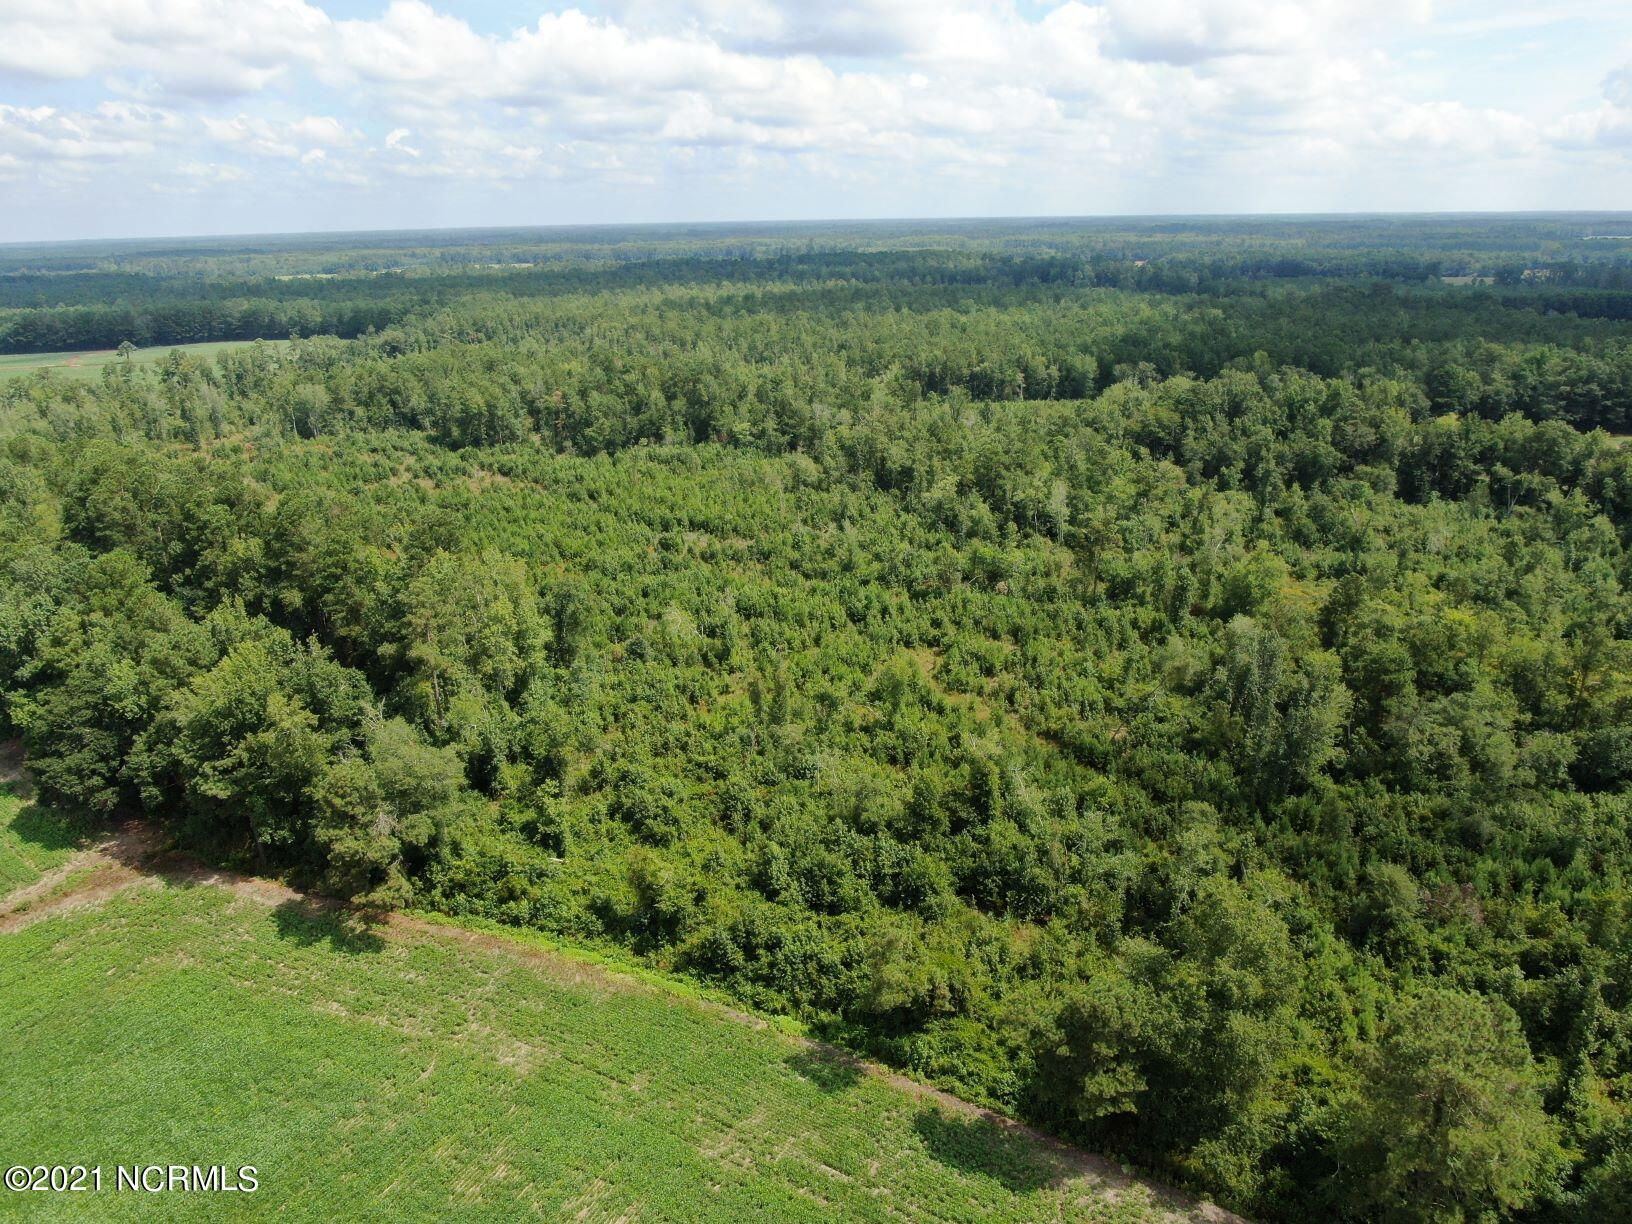 Tbd Doodle Hill Road, Cerro Gordo, North Carolina 28430, ,Undeveloped,For sale,Doodle Hill,100284545